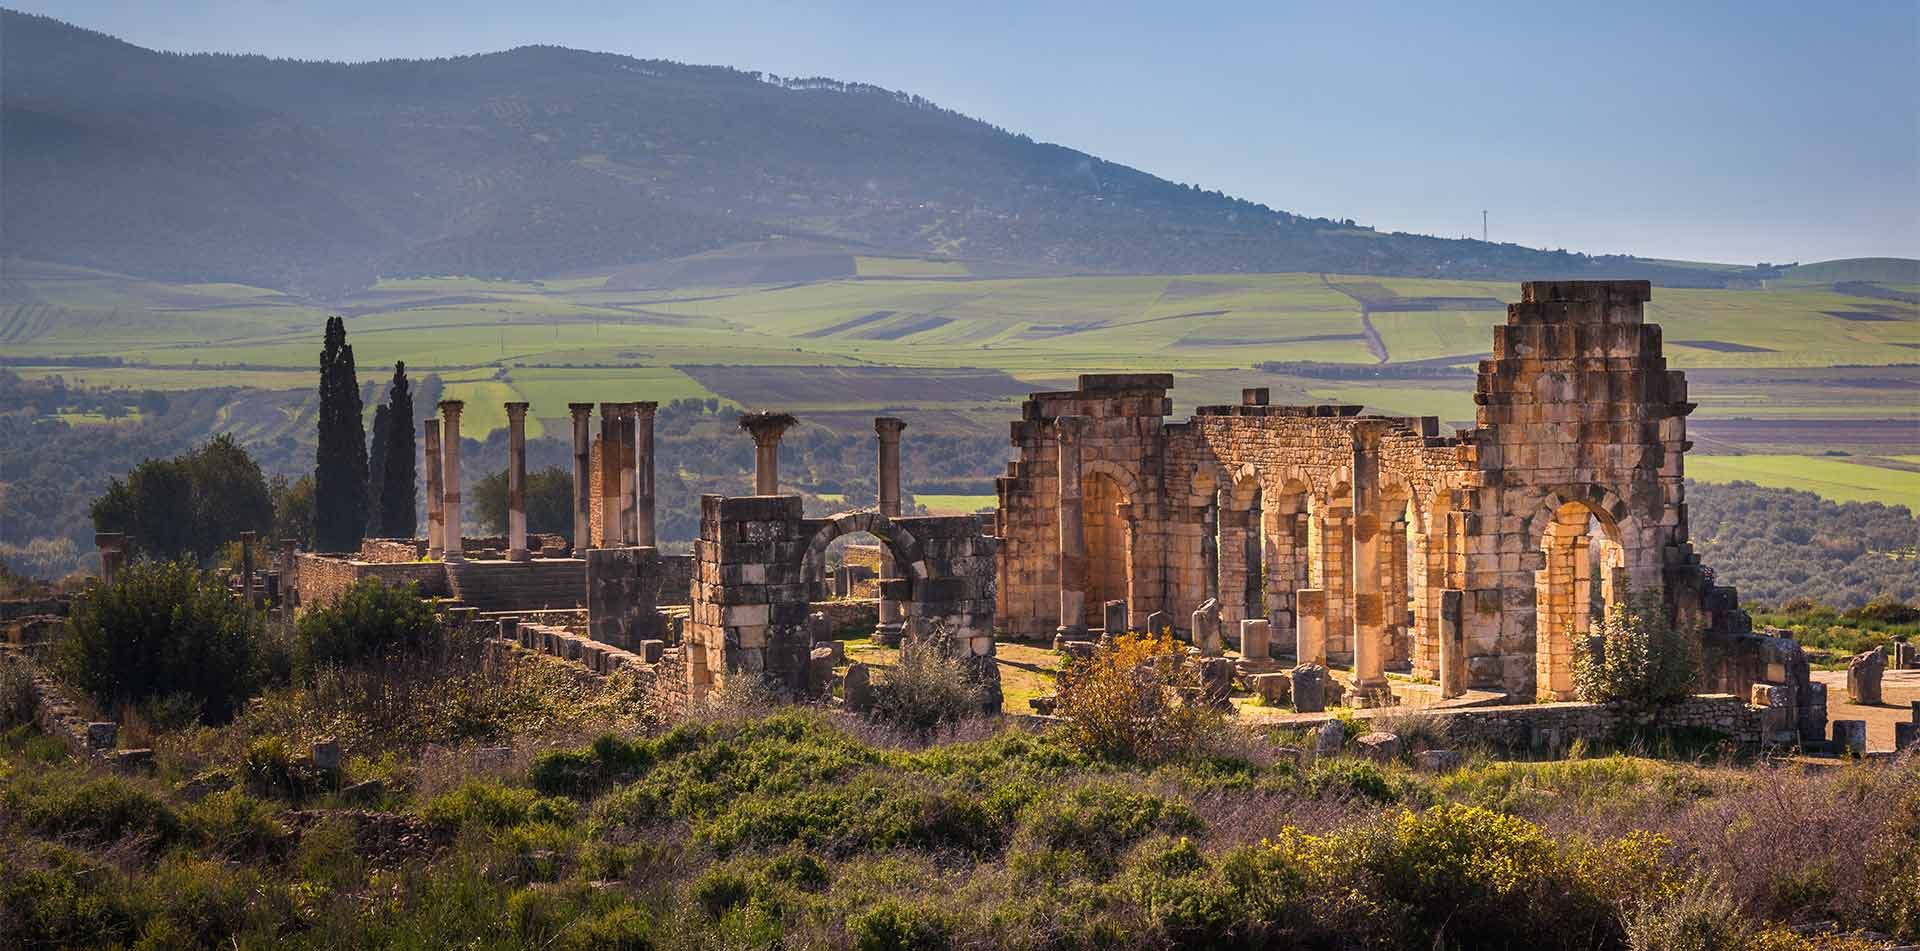 Roman ruins at Volubilis Morocco